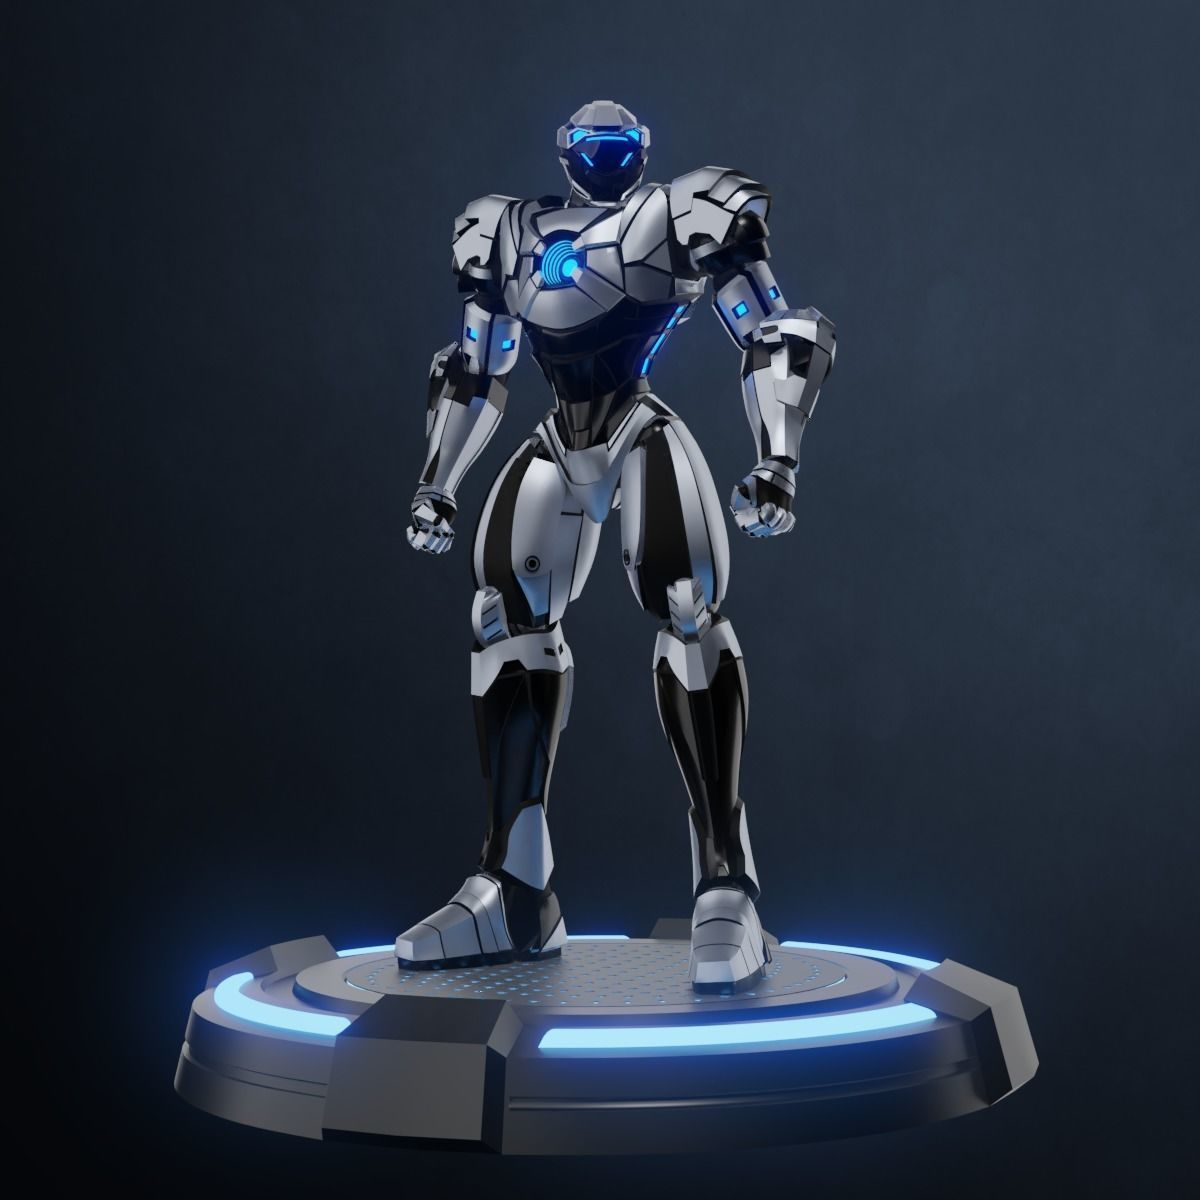 Robot character mecha game asset 3D model in 2020